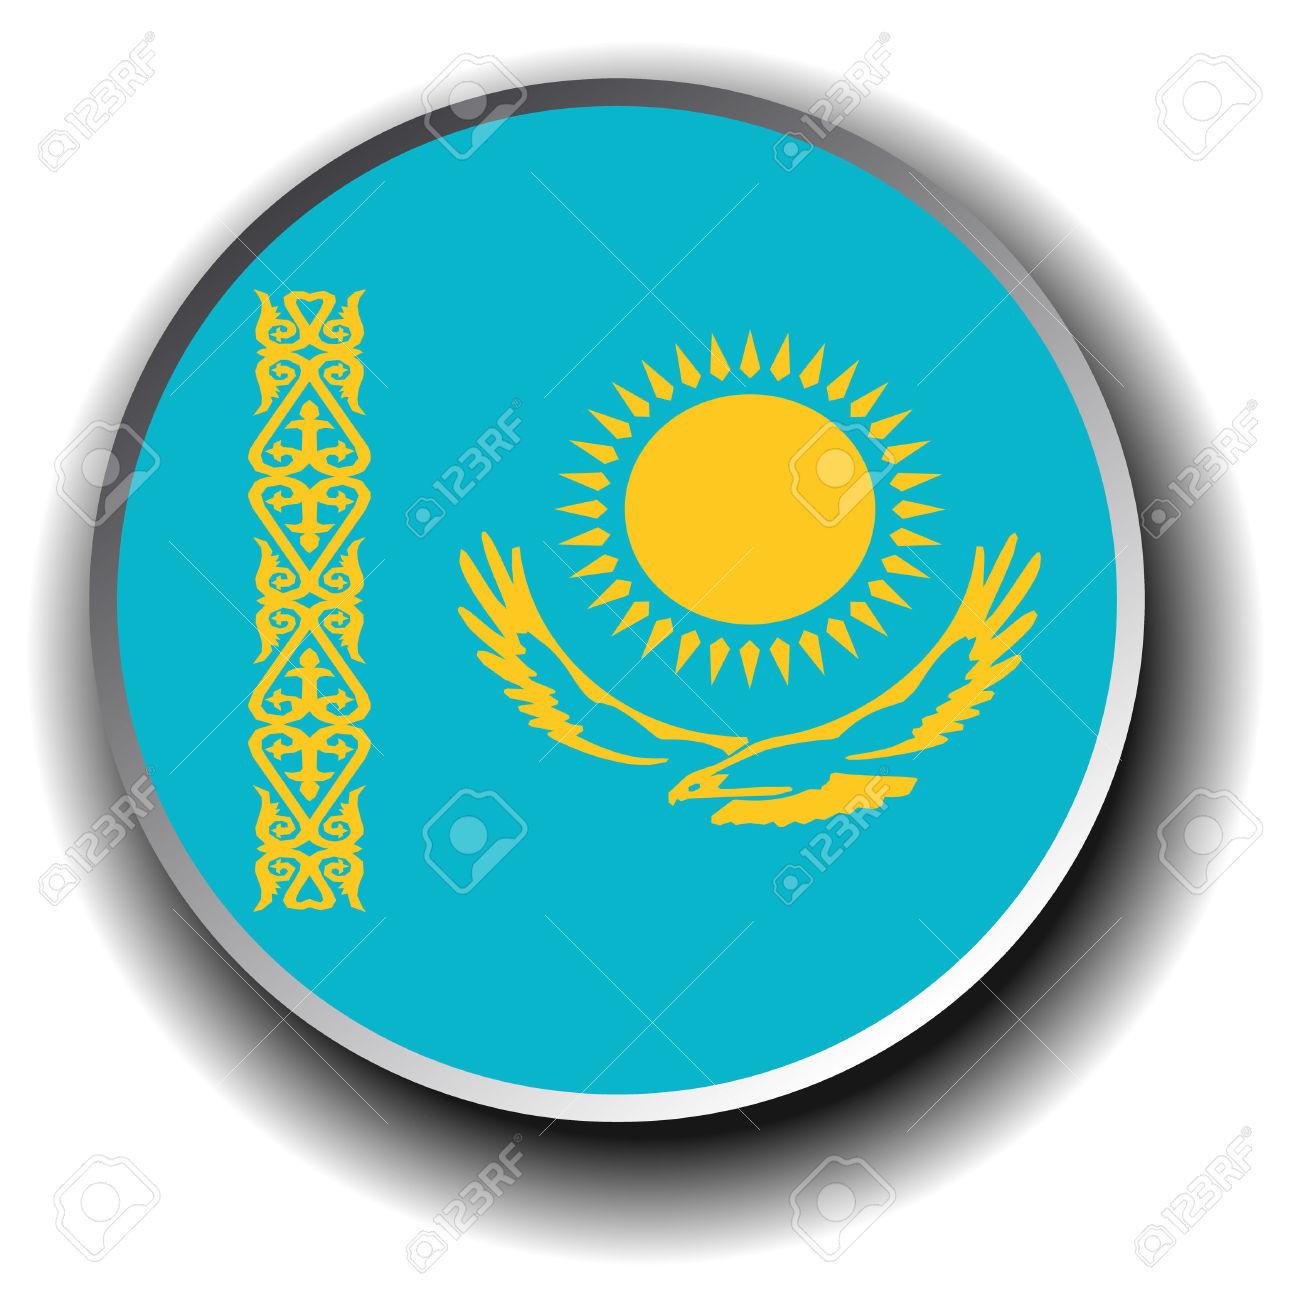 Kazakhstan clipart #8, Download drawings